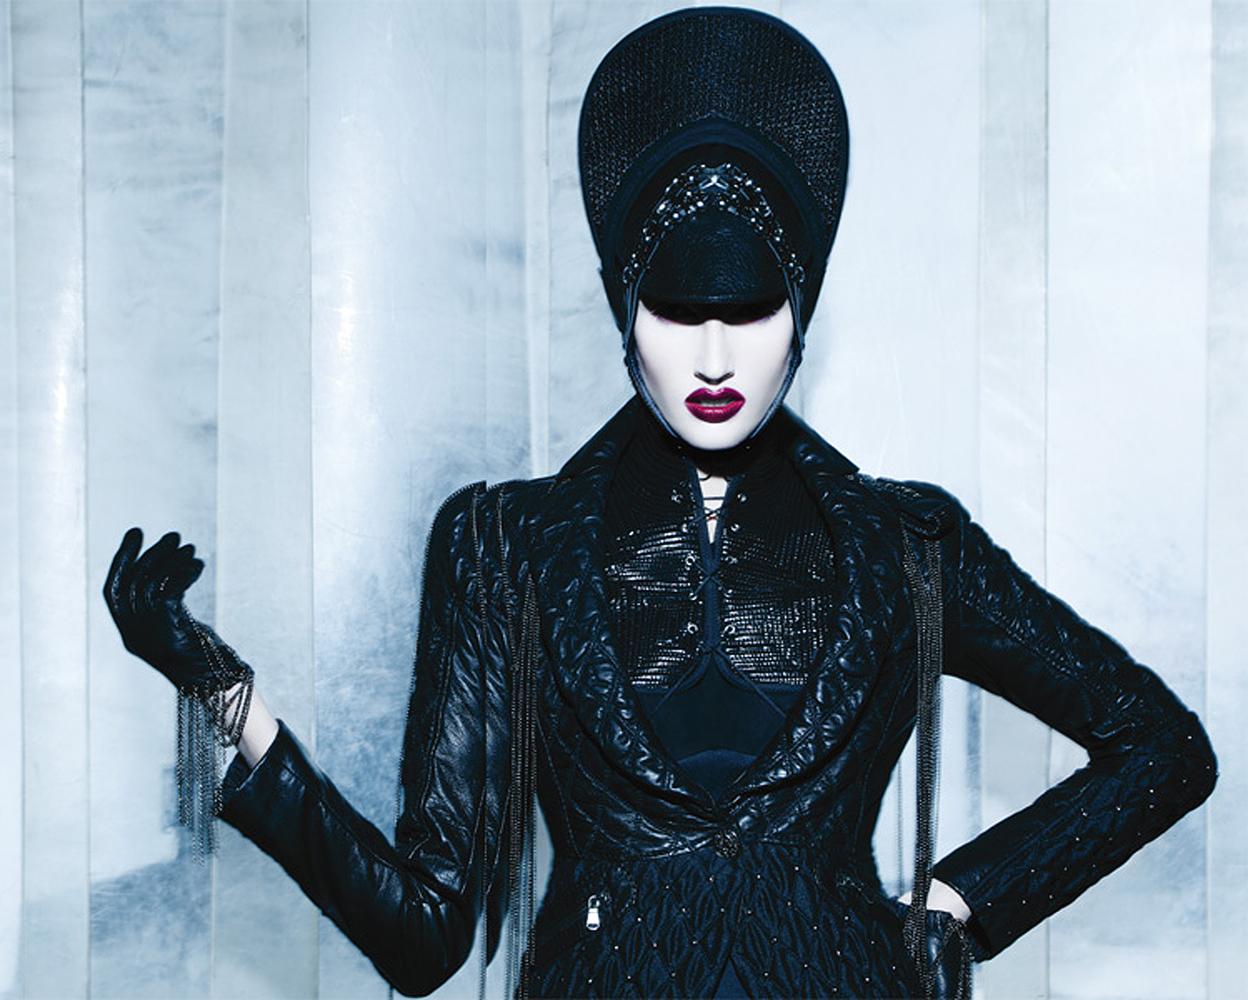 Paco Peregrin - Amanda Moreno - stylist Kattaca - hair:makeup Lewis Amarante